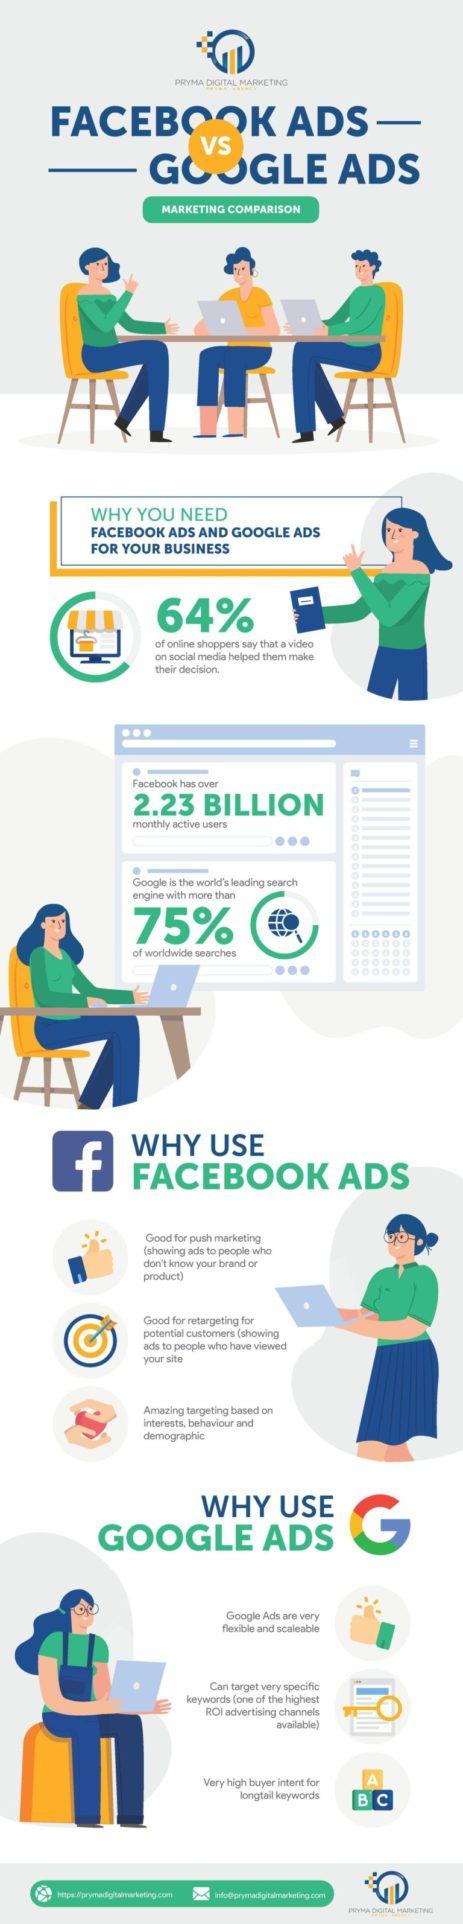 Facebook Ads vs. Google Ads [Marketing Comparison]